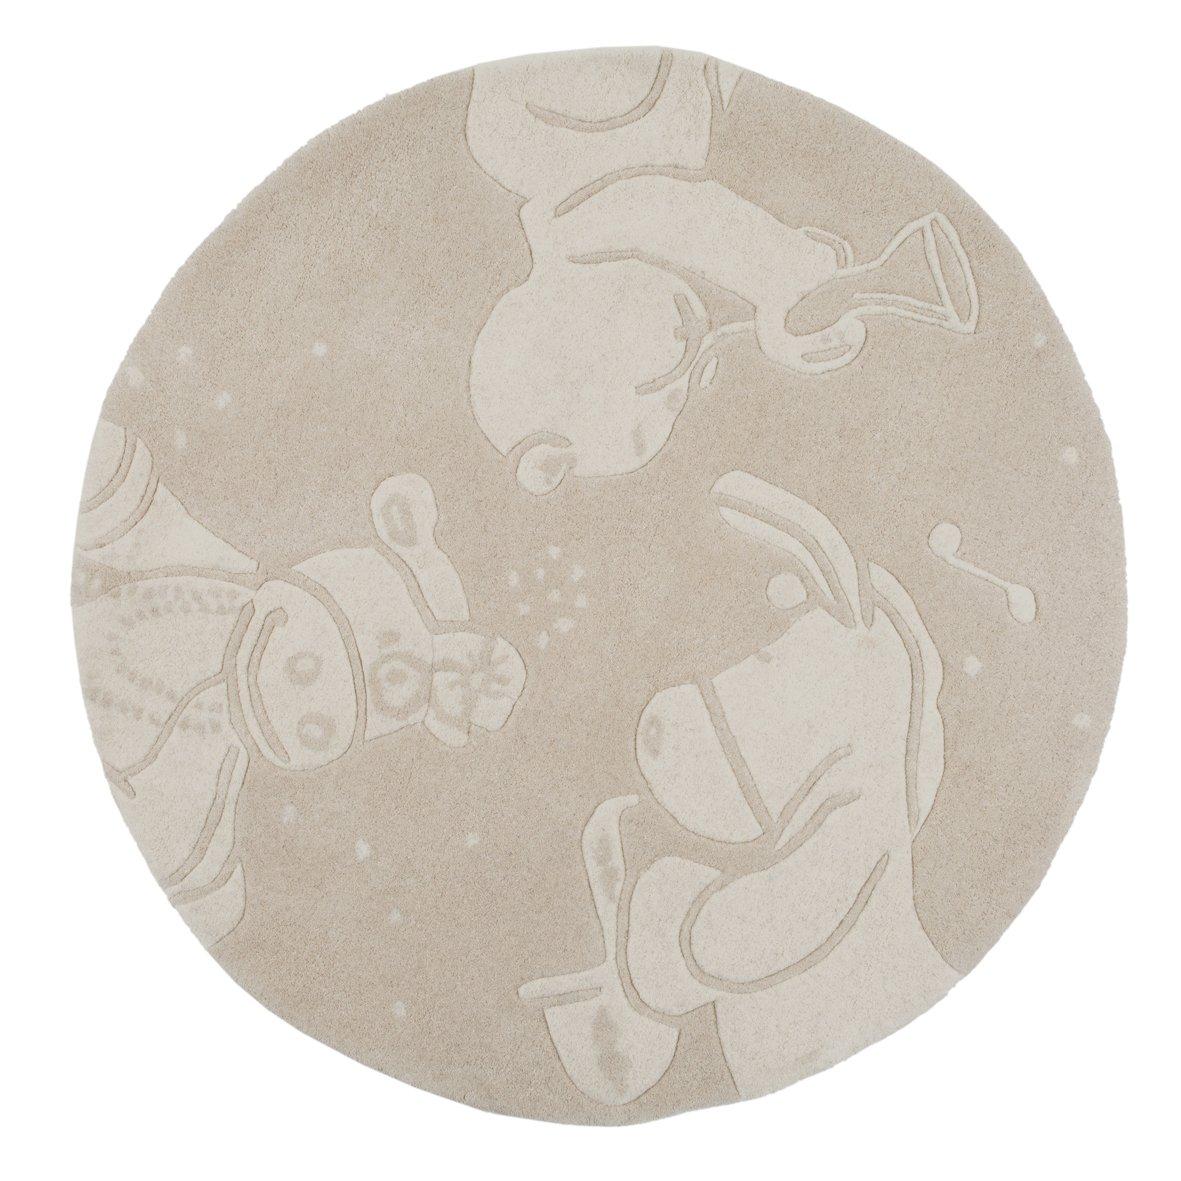 Noukies BB1420.85 Jazz Teppich Wolle, 100 x 150 cm